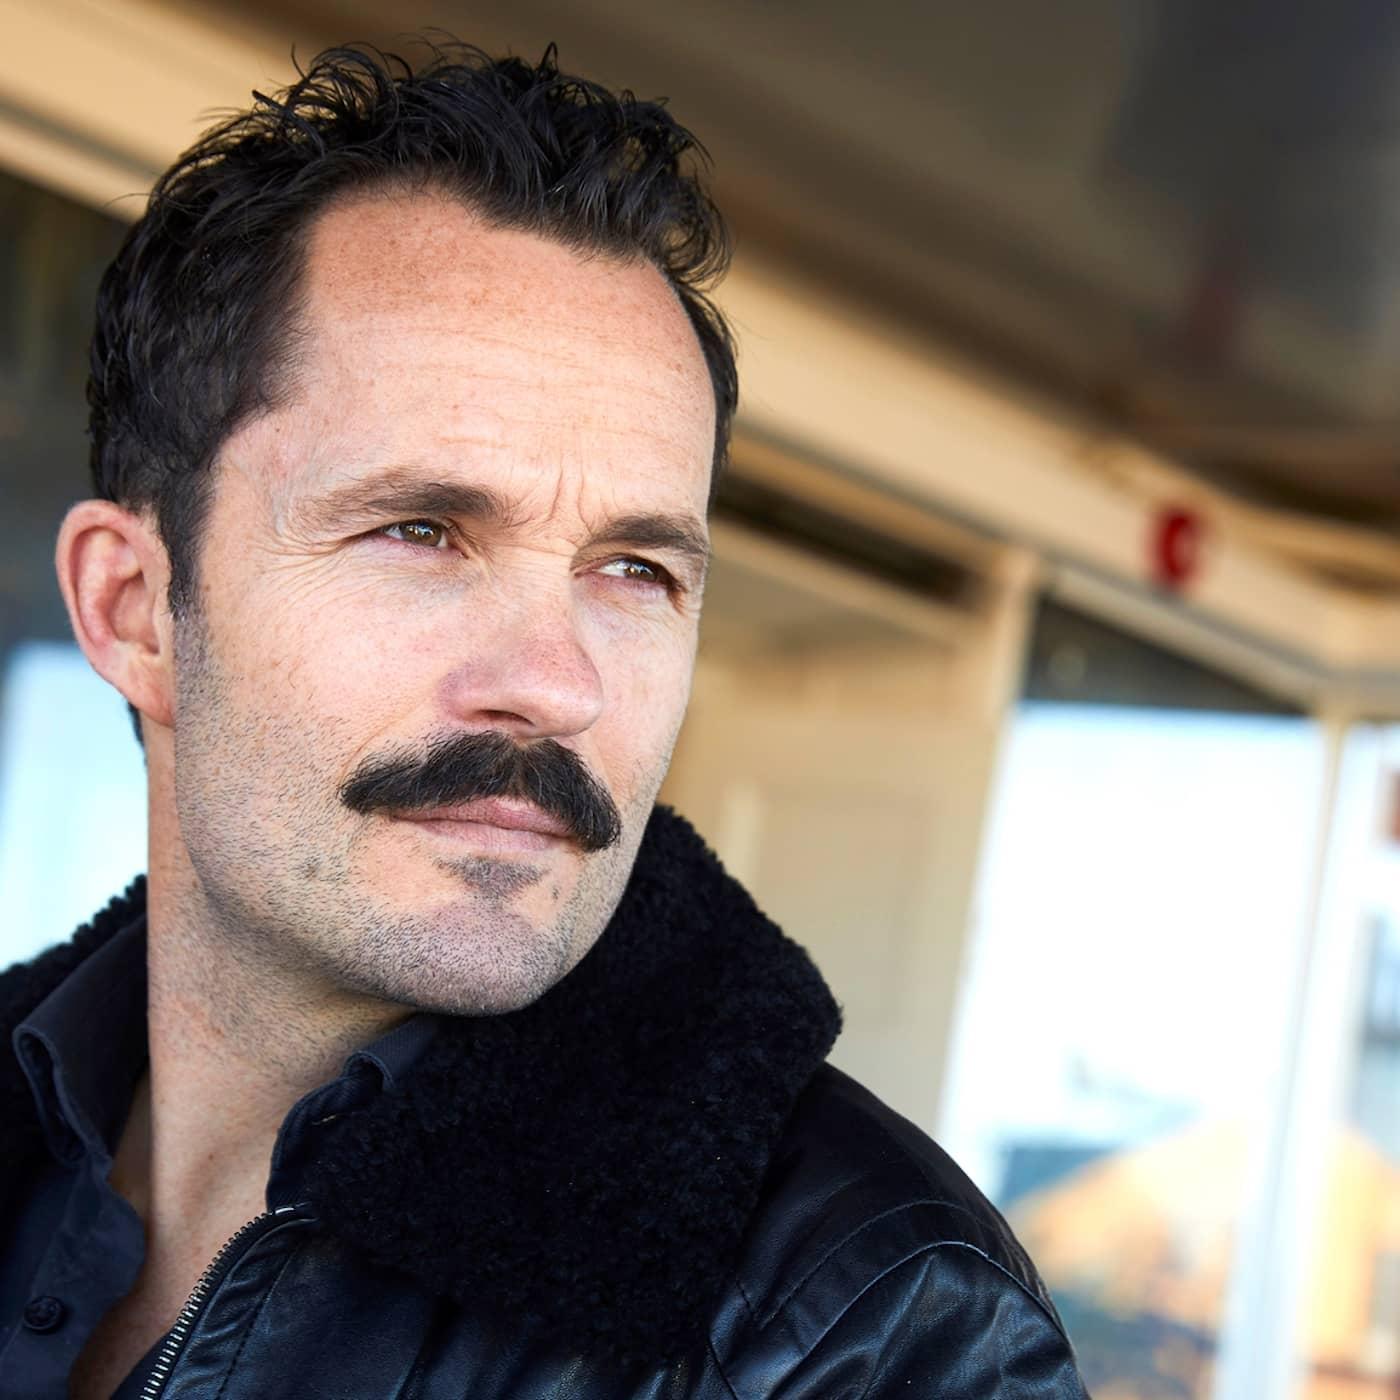 Radioföljetongen: Samtal med Jens Liljestrand om Vilhelm Moberg